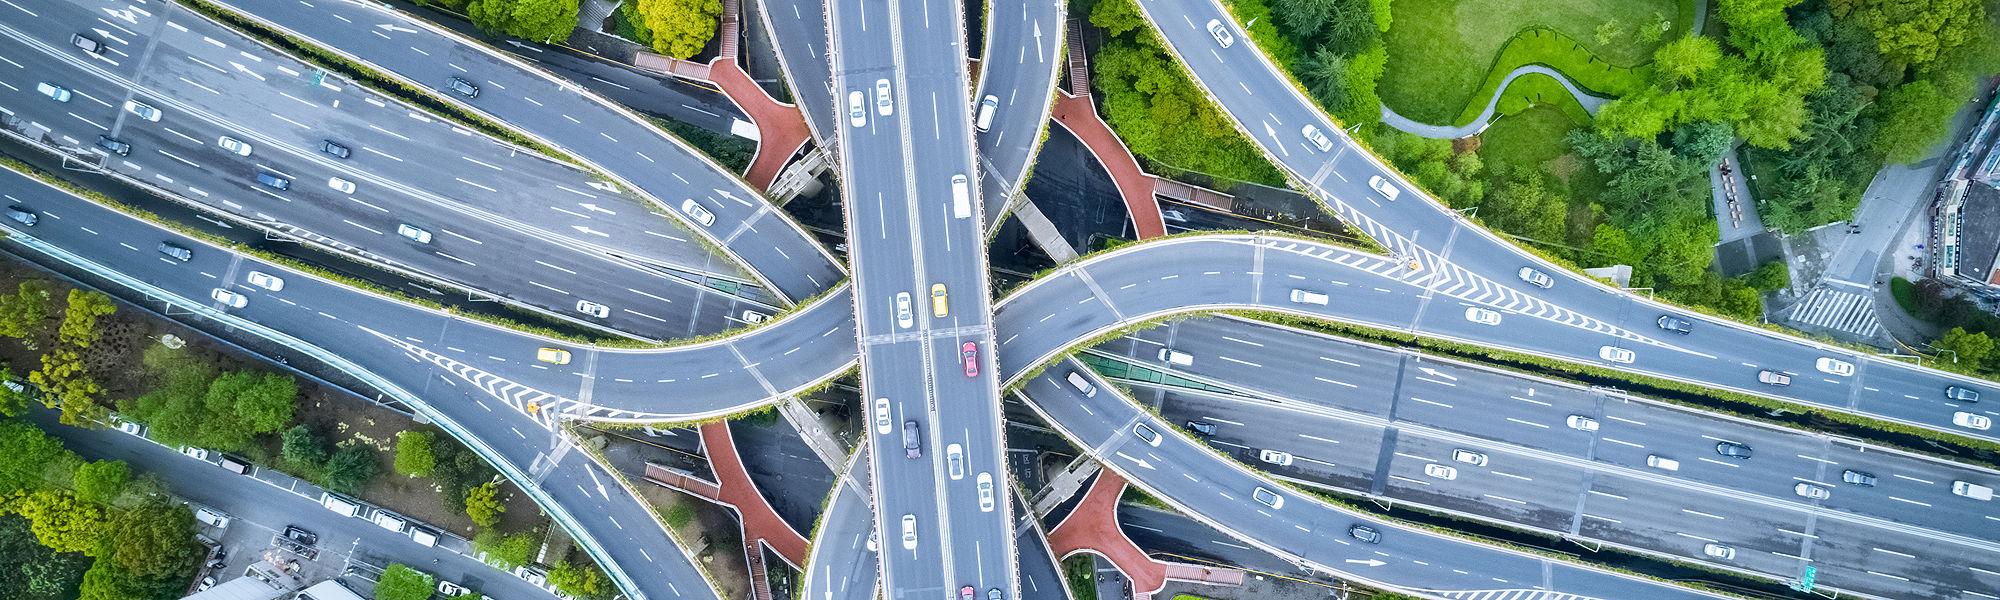 Aerial interchange highway Shanghai China